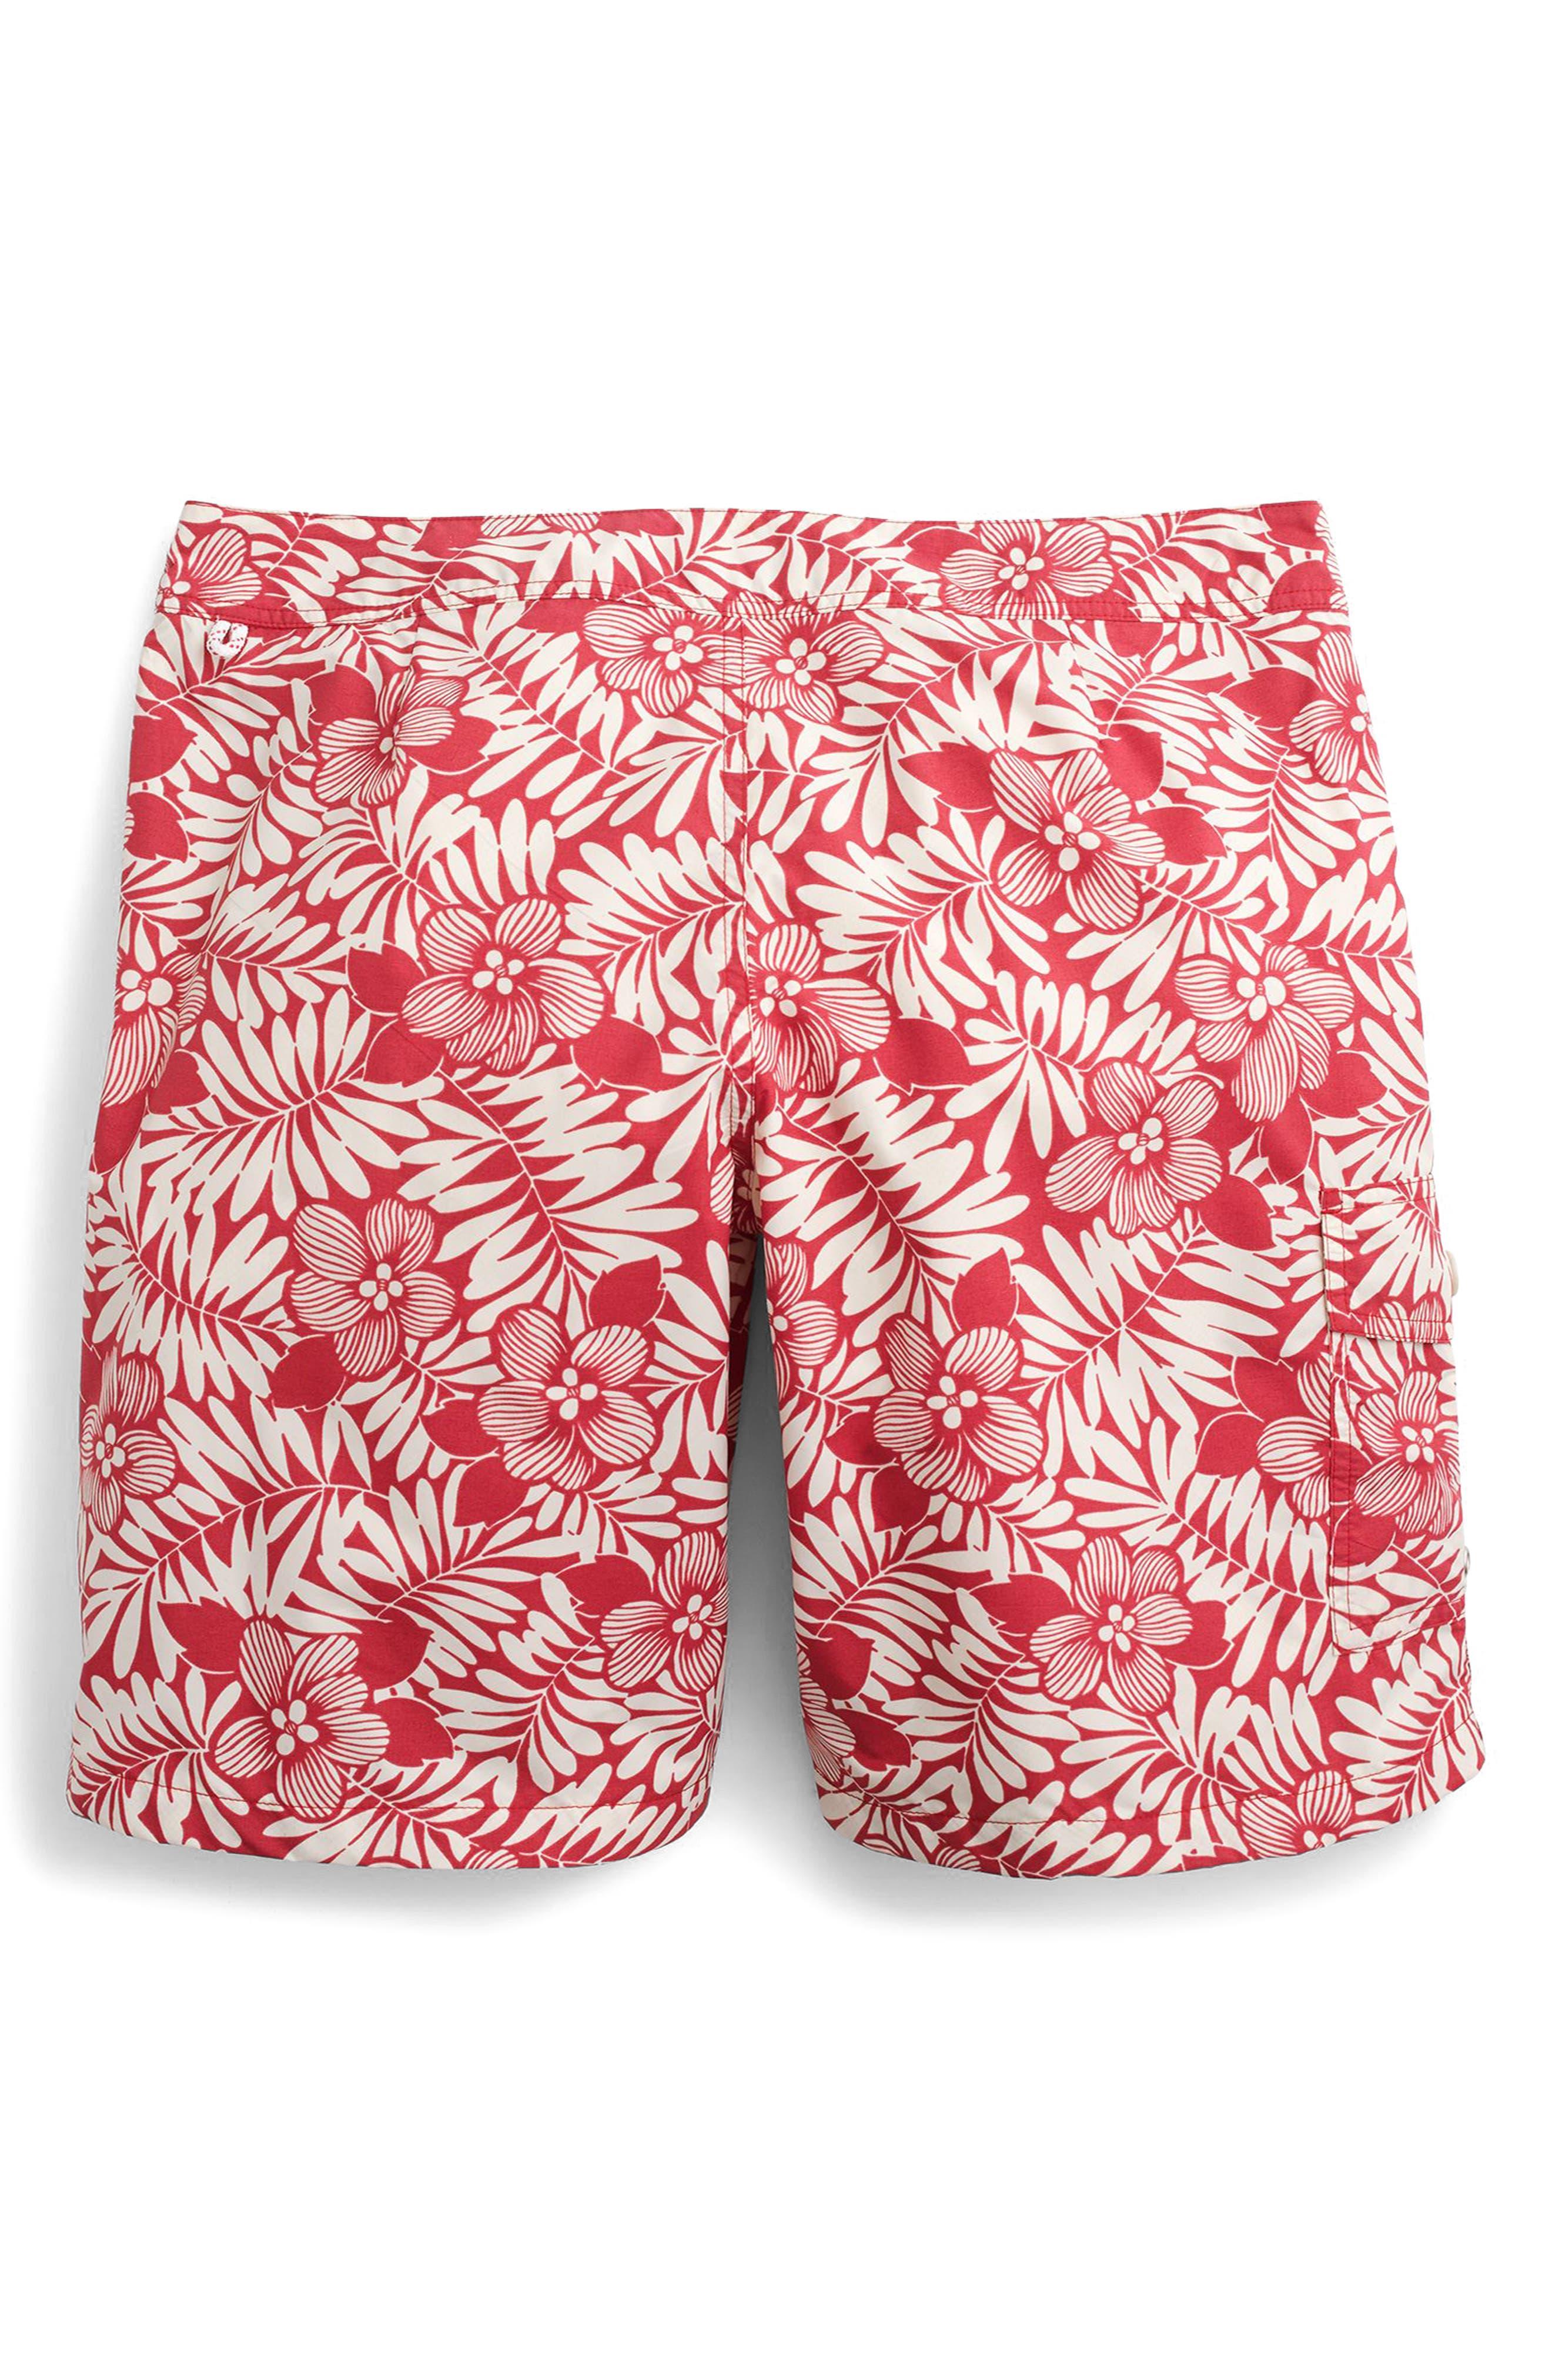 Fern Print Board Shorts,                             Alternate thumbnail 4, color,                             610